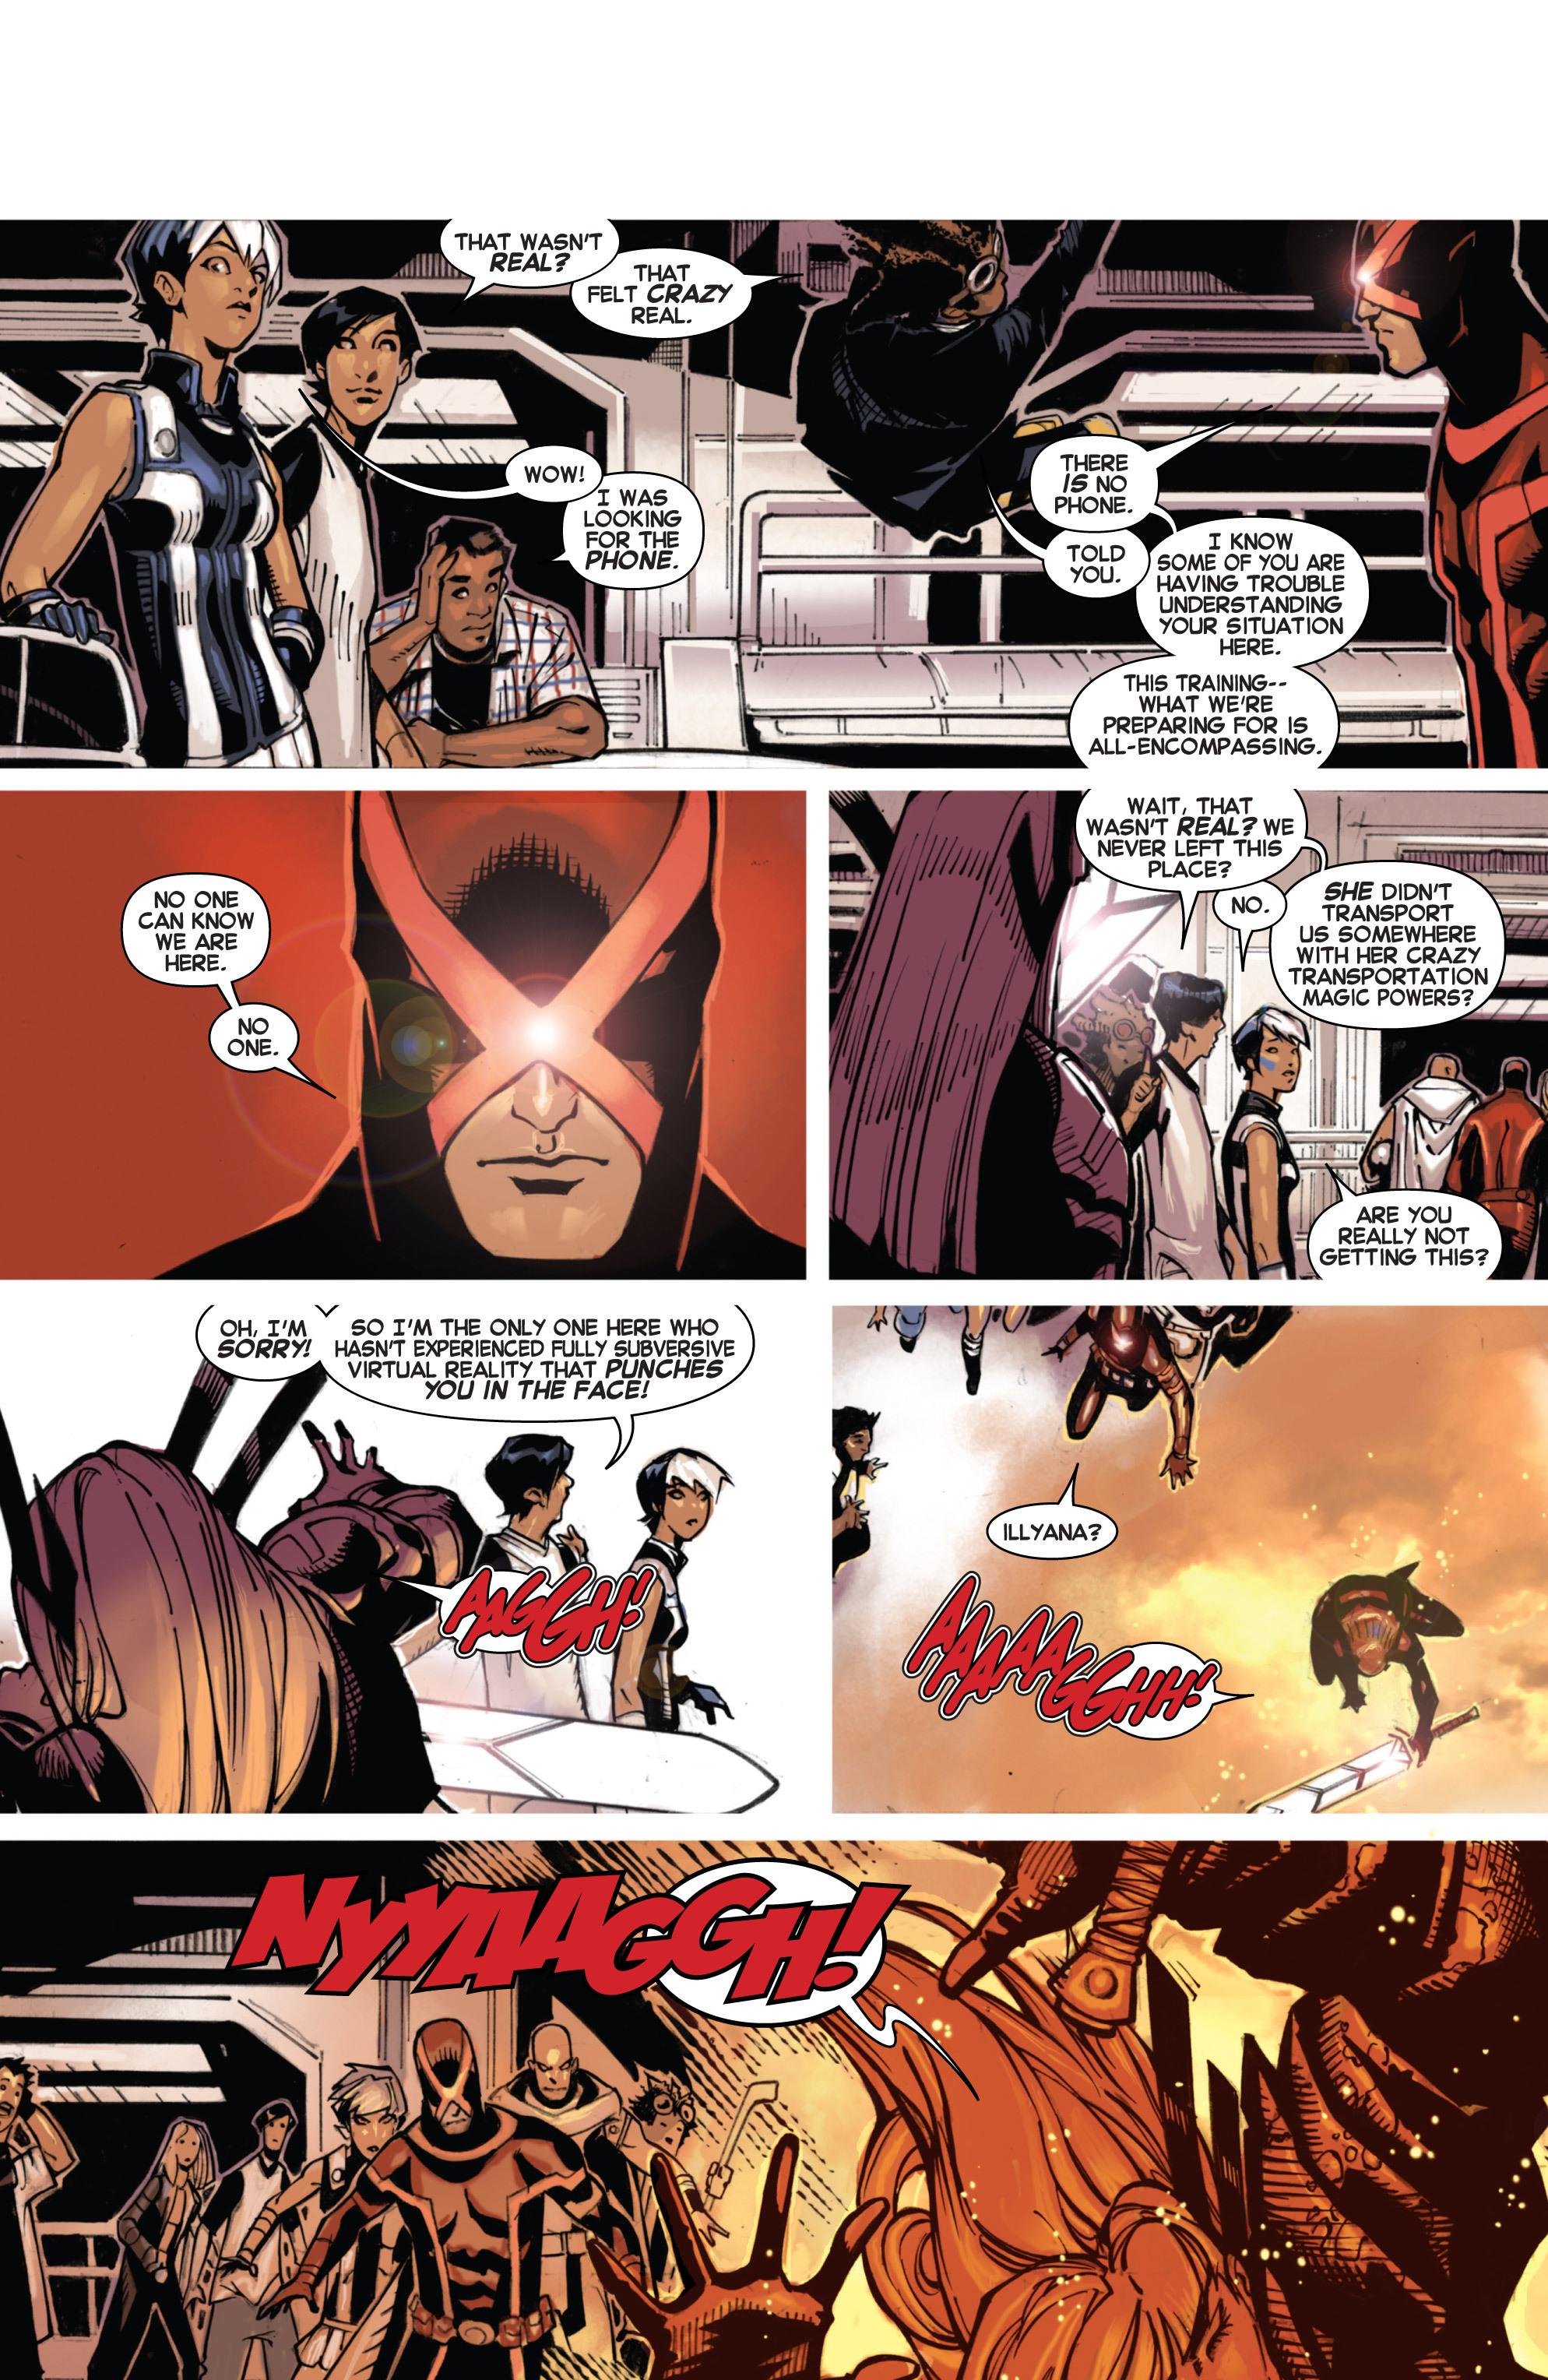 Read online Uncanny X-Men (2013) comic -  Issue # _TPB 1 - Revolution - 79